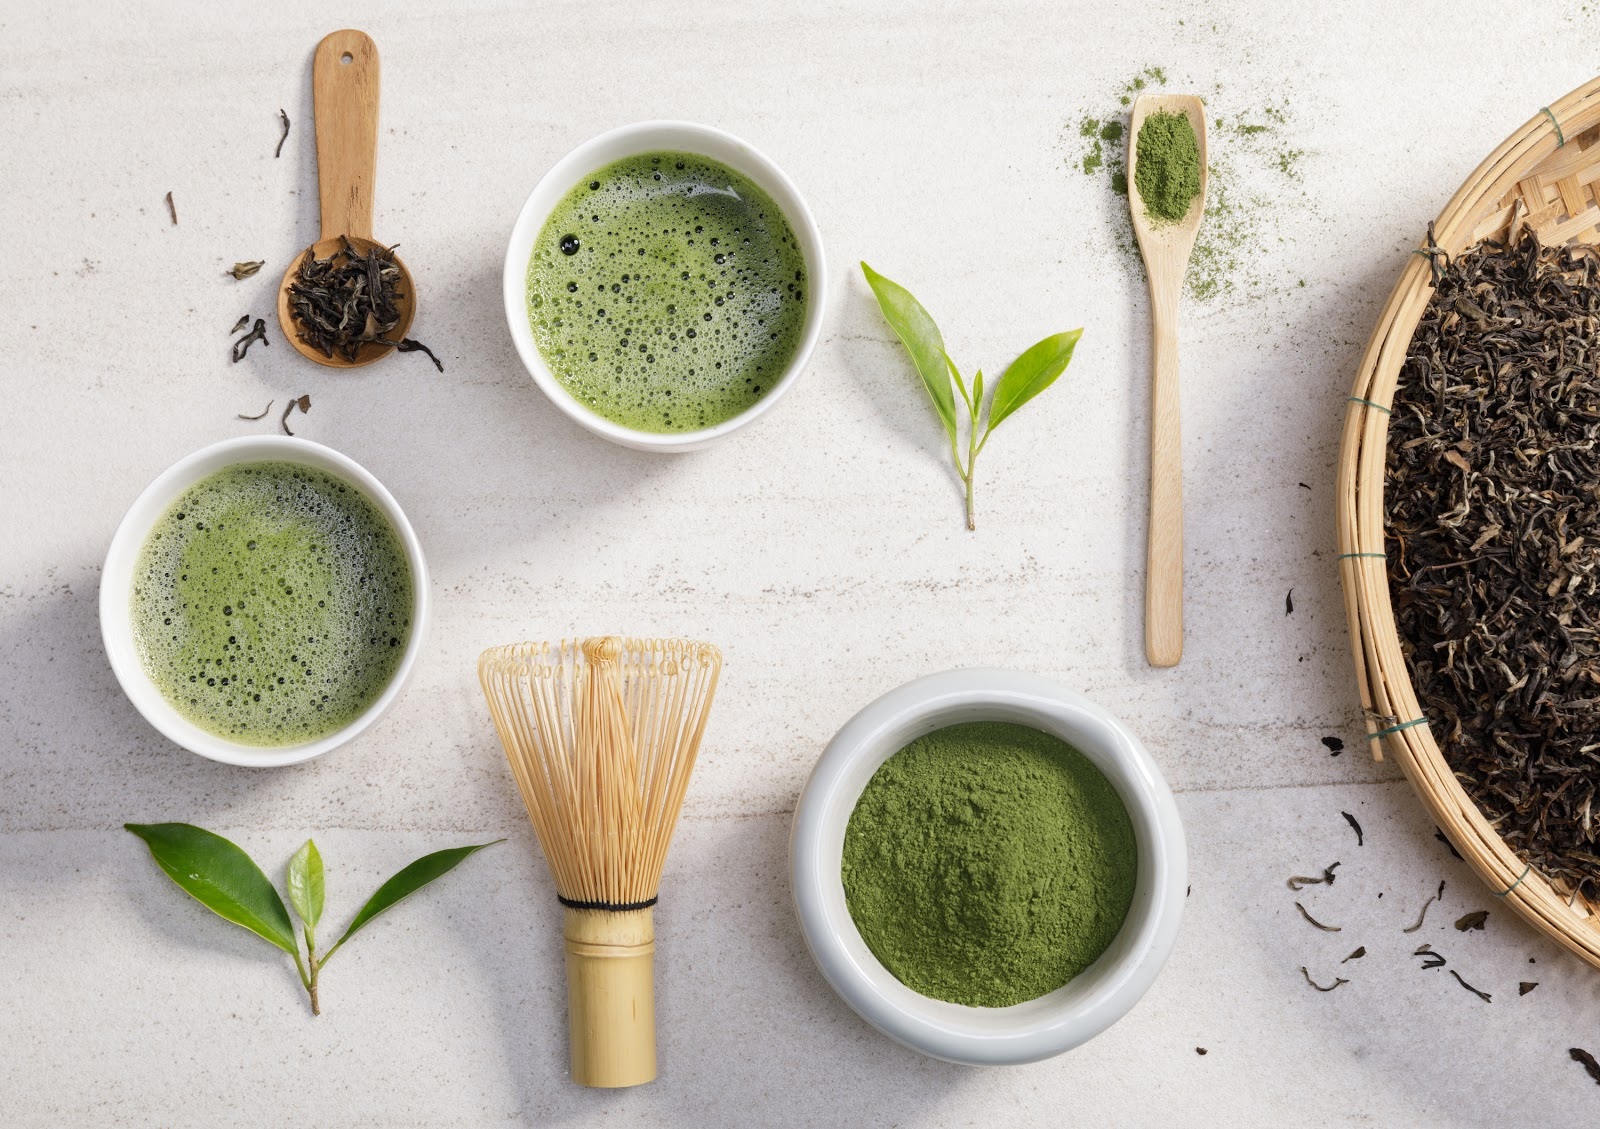 matcha tea and tools